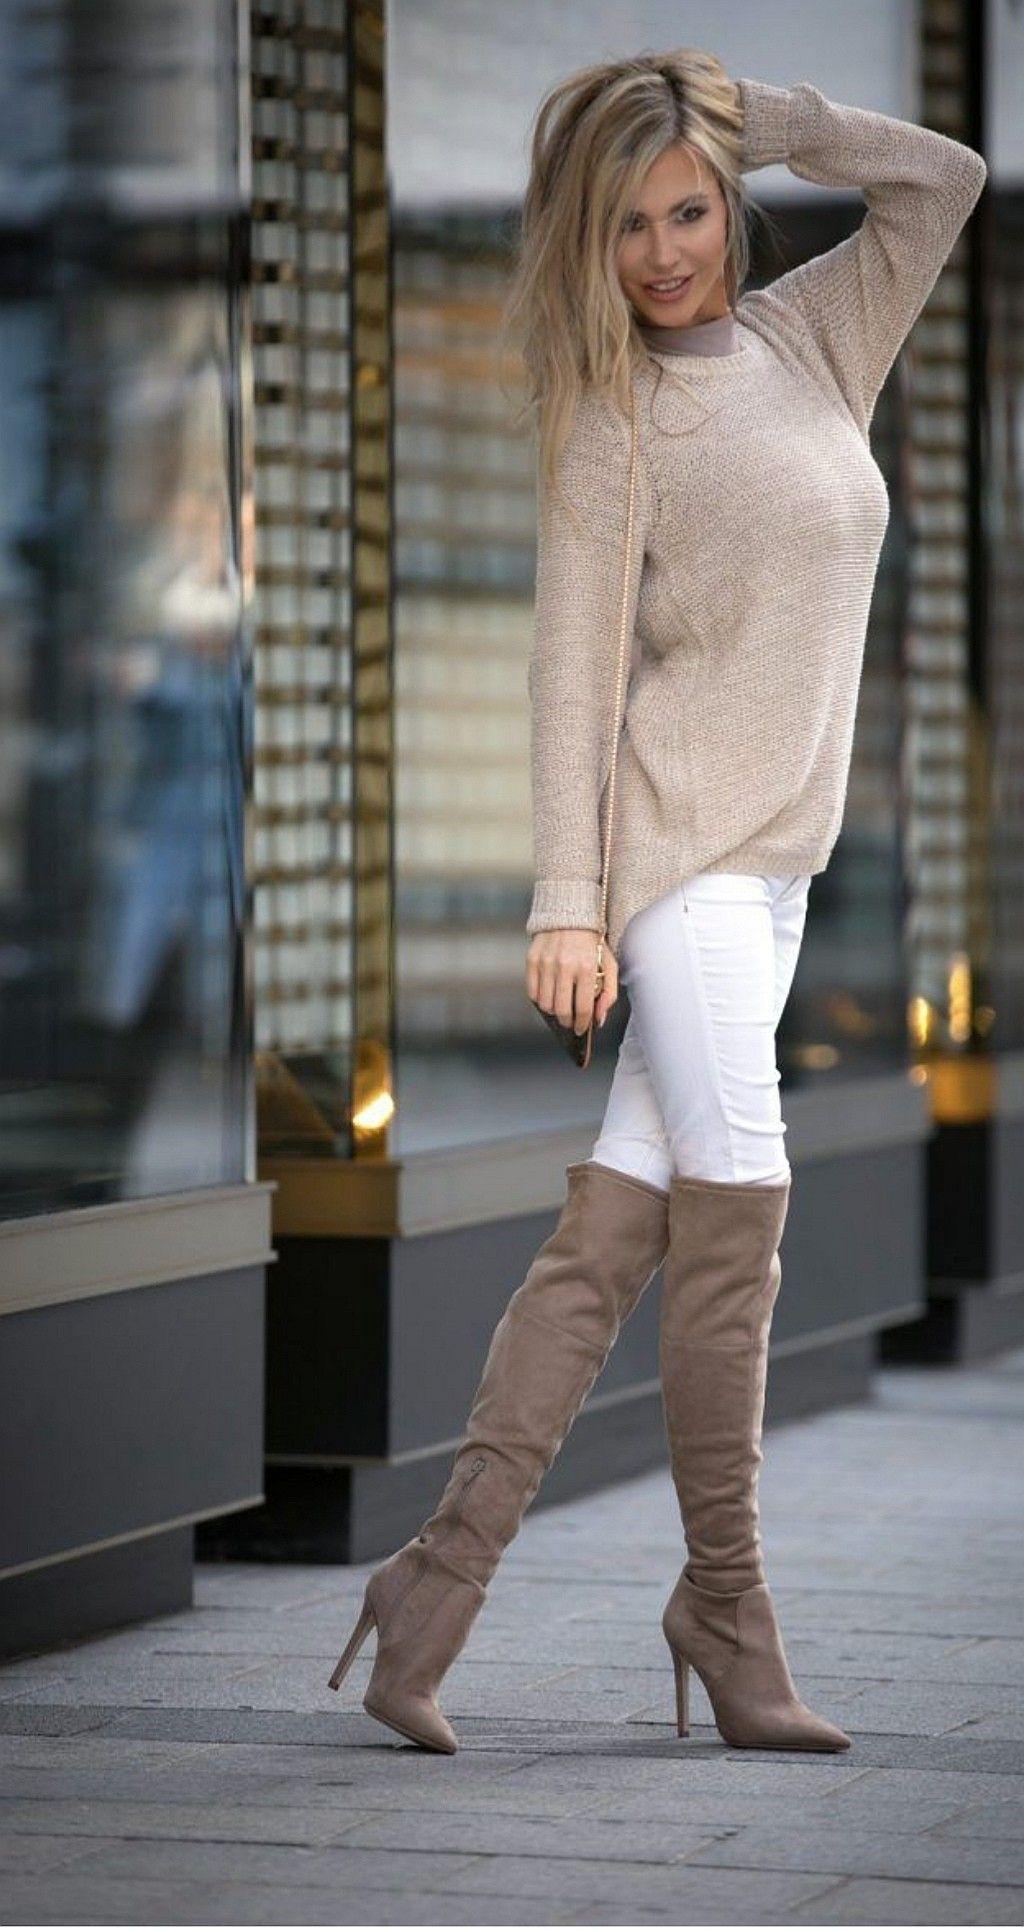 6688a976eaf High heels boots